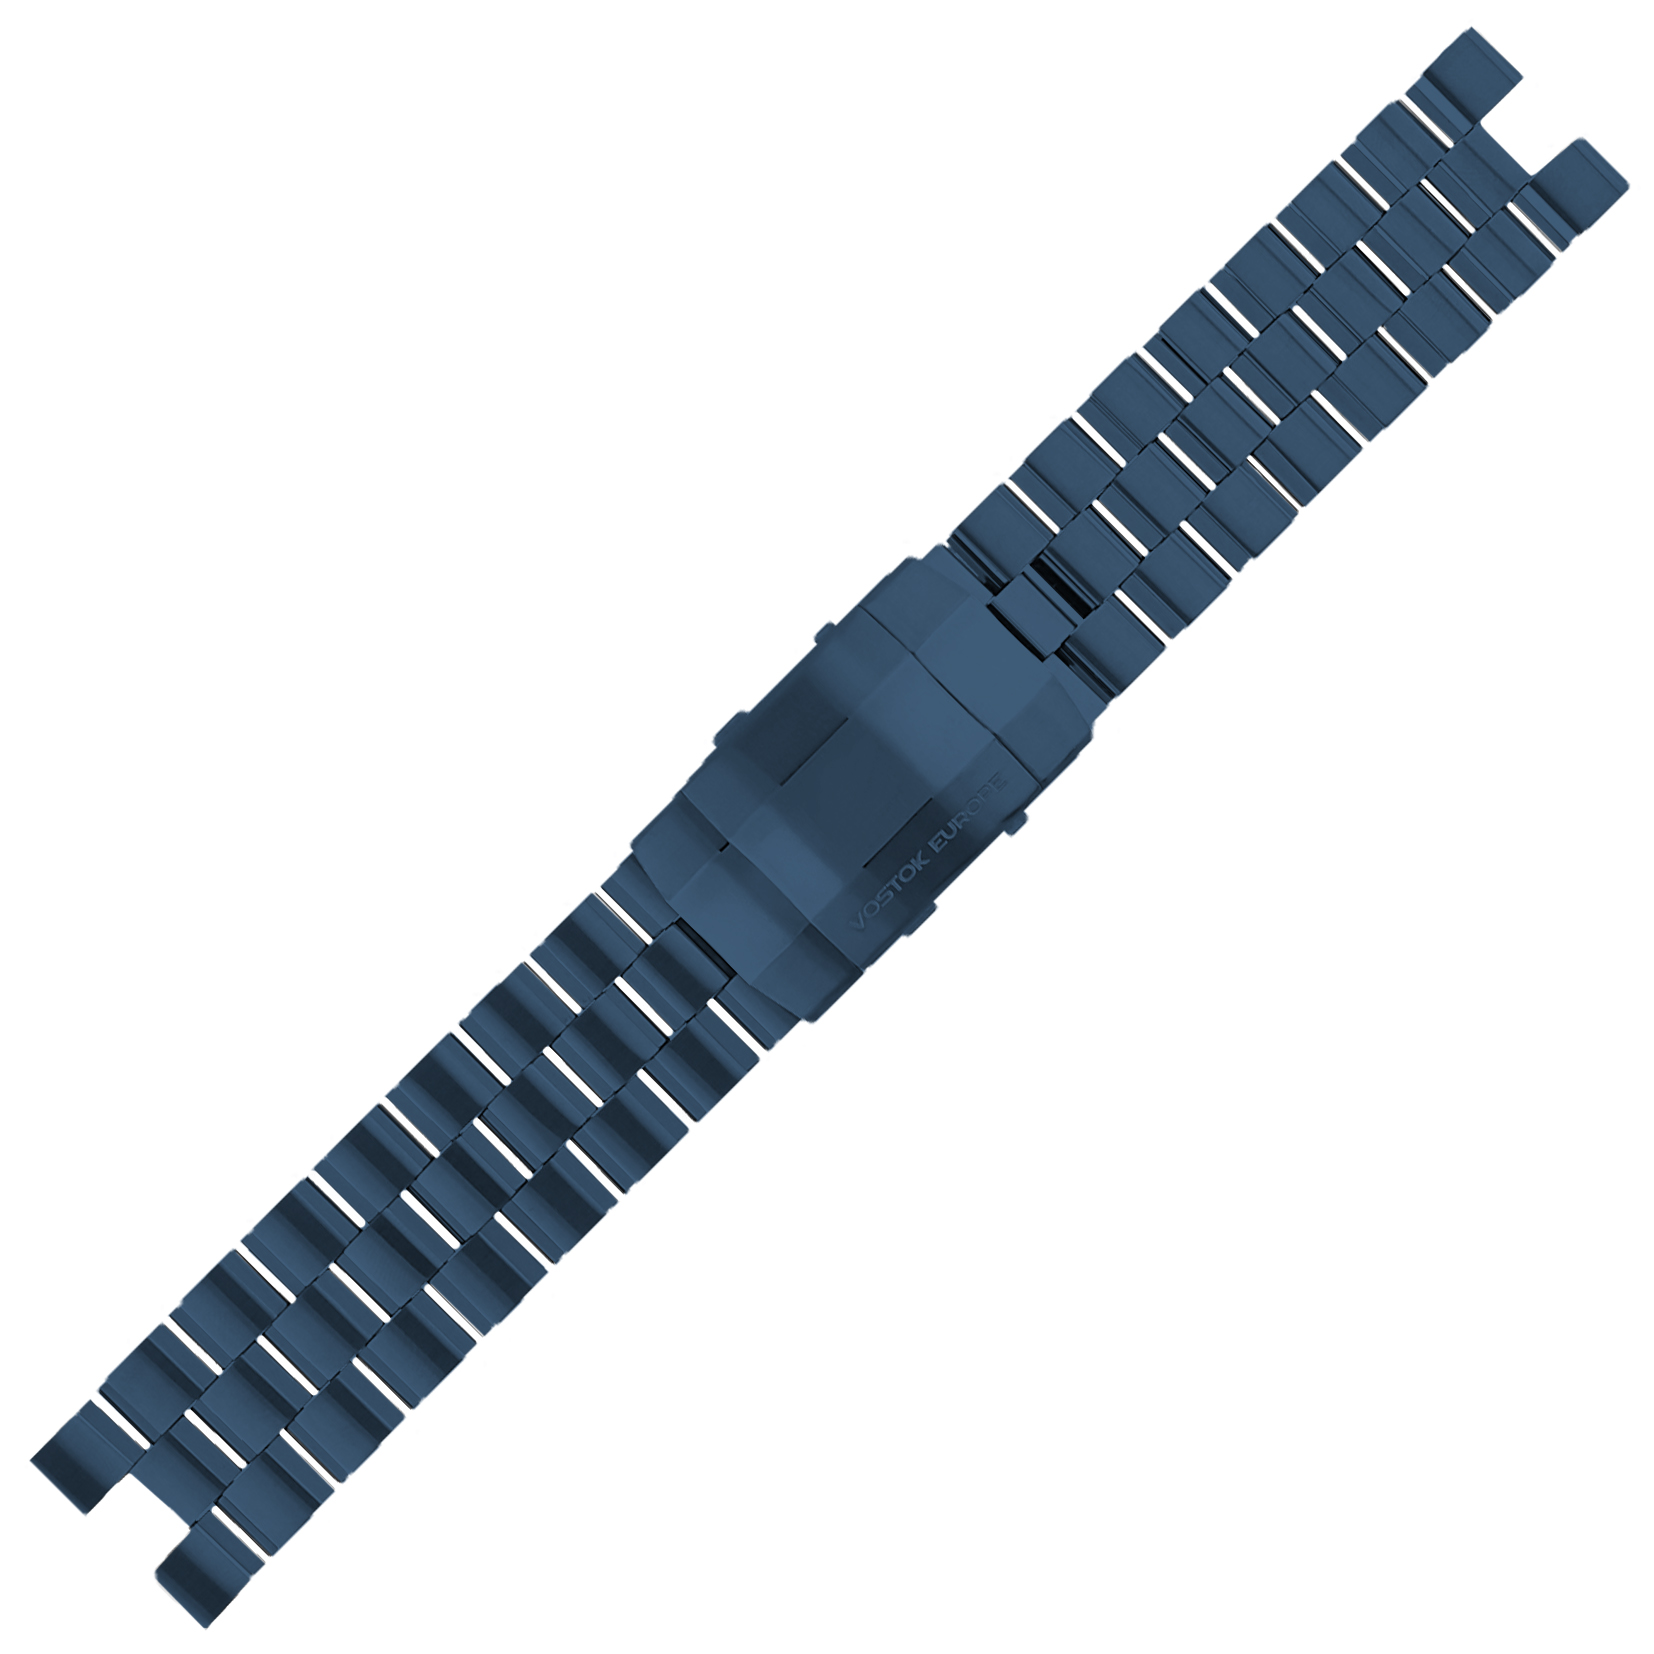 Vostok Europe B-Lunokhod-0.76006 Bransoleta Lunokhod - niebieska